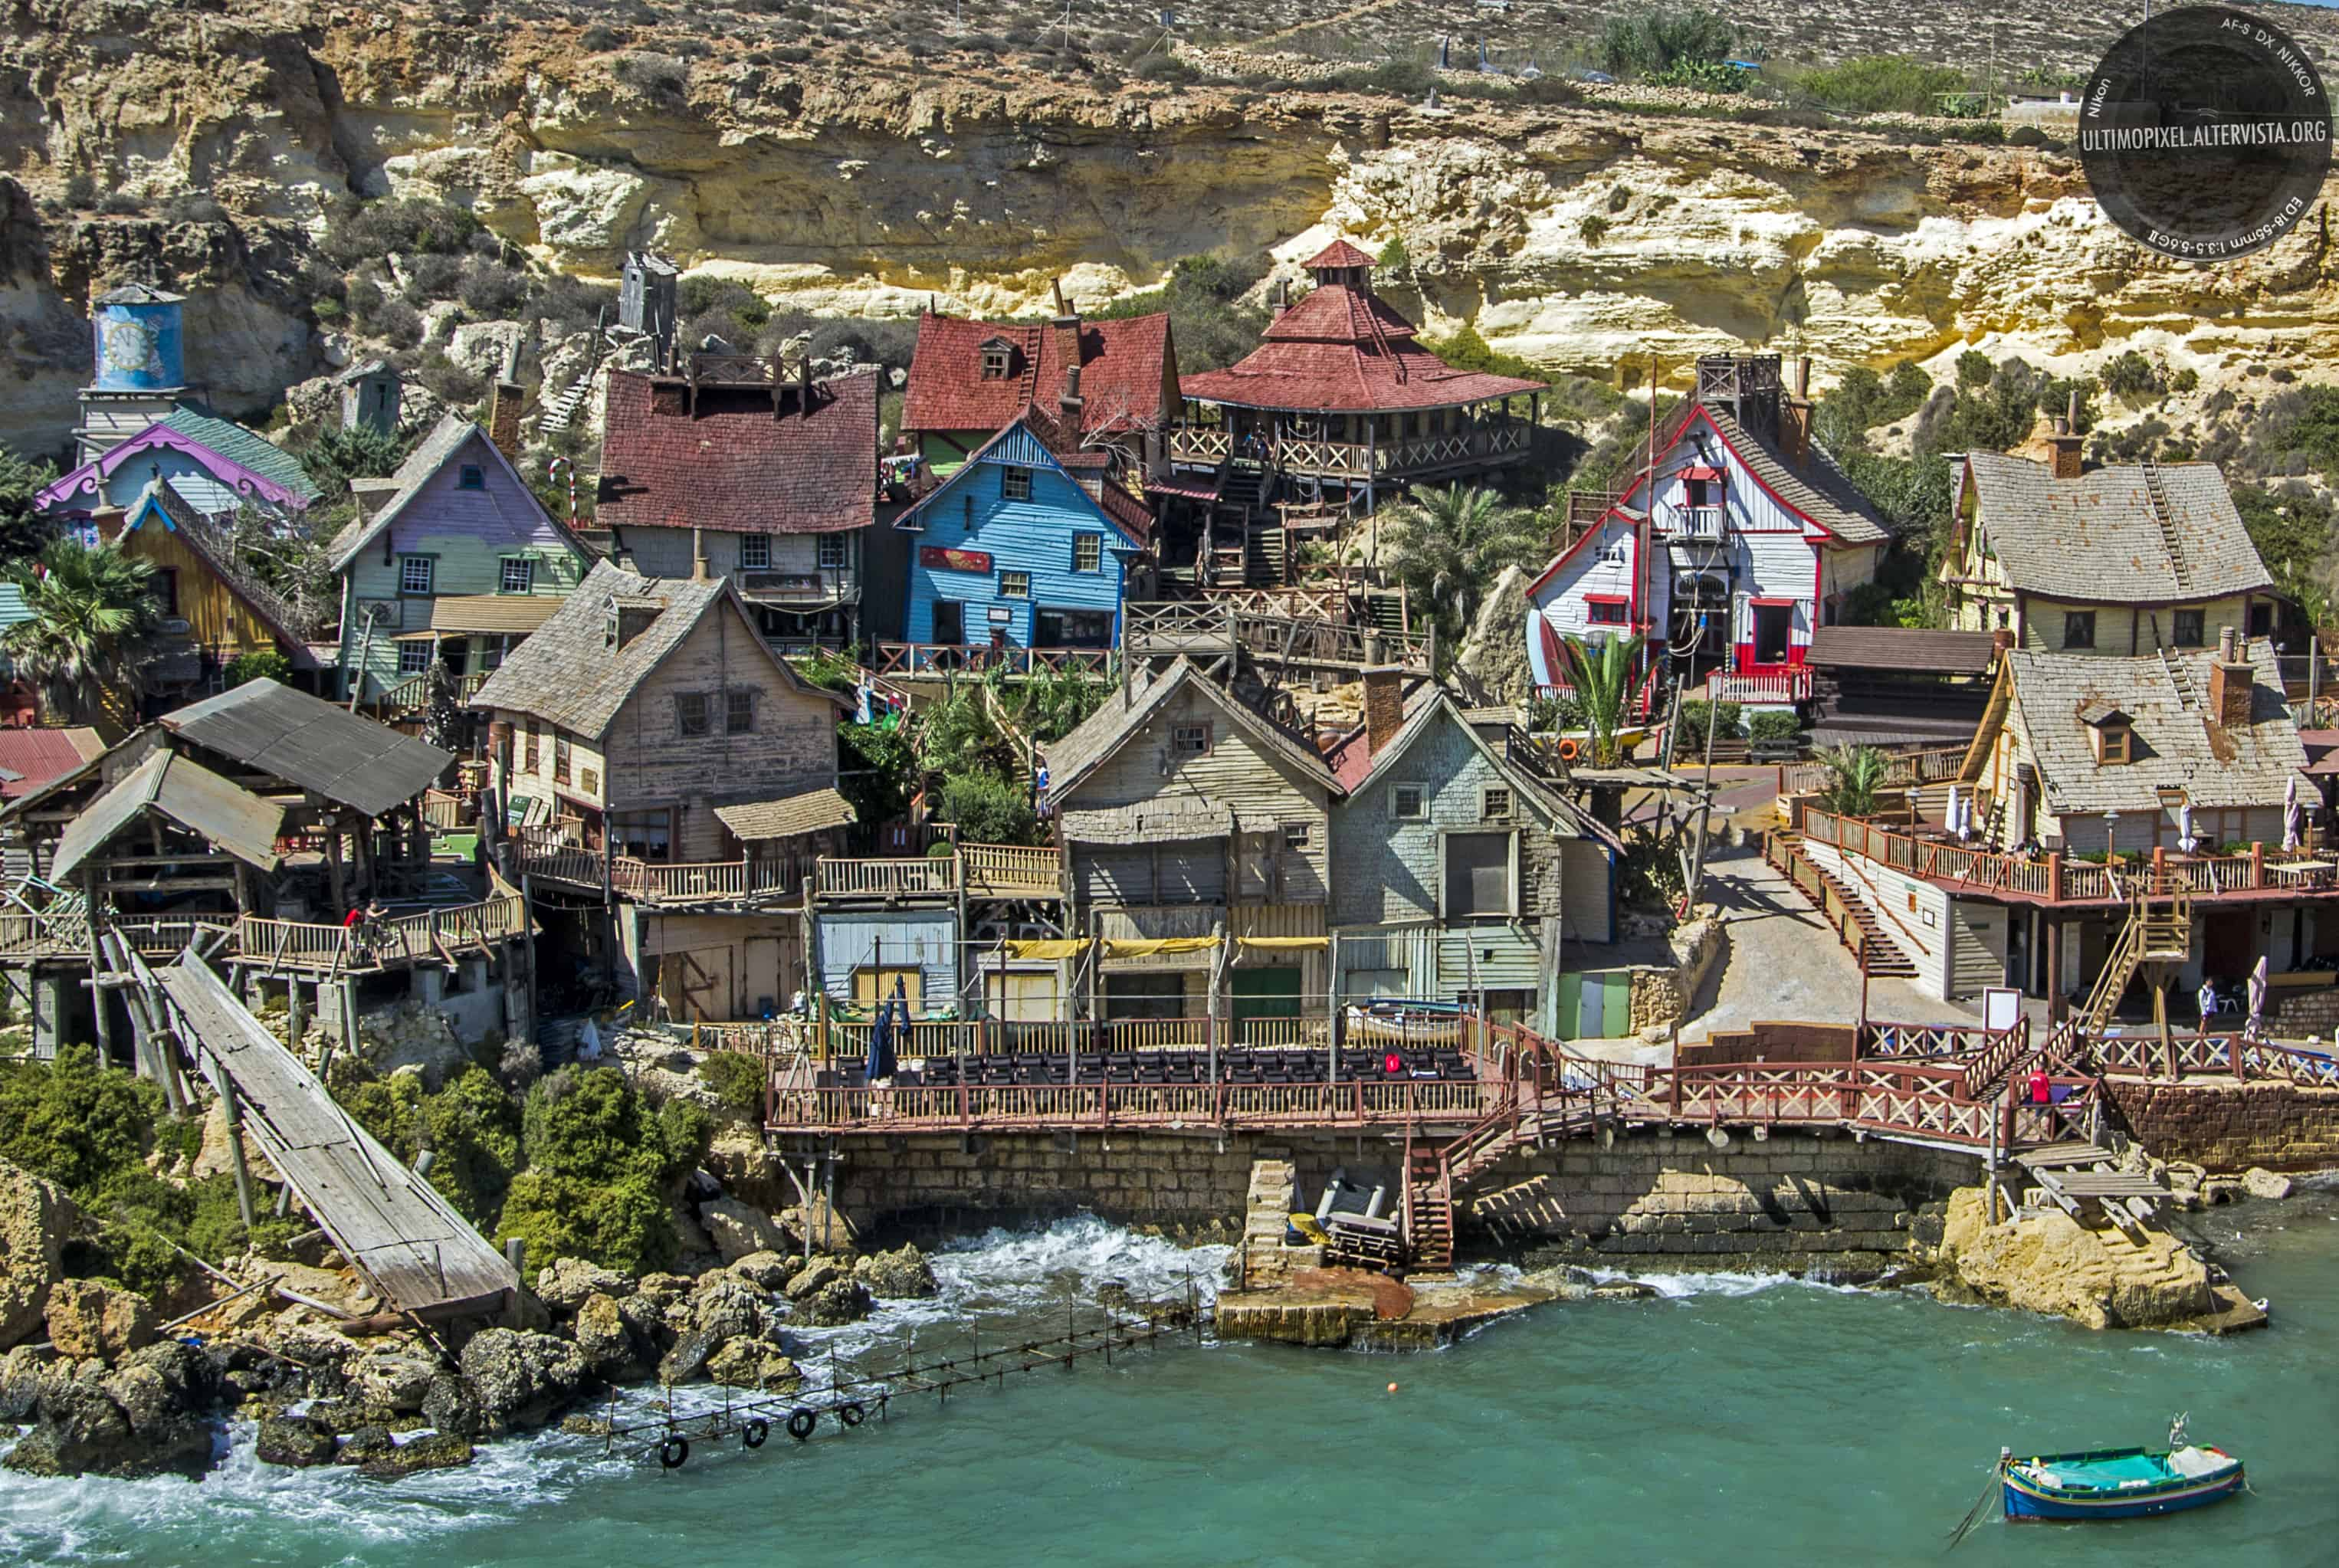 Popeye Village in Mellieha